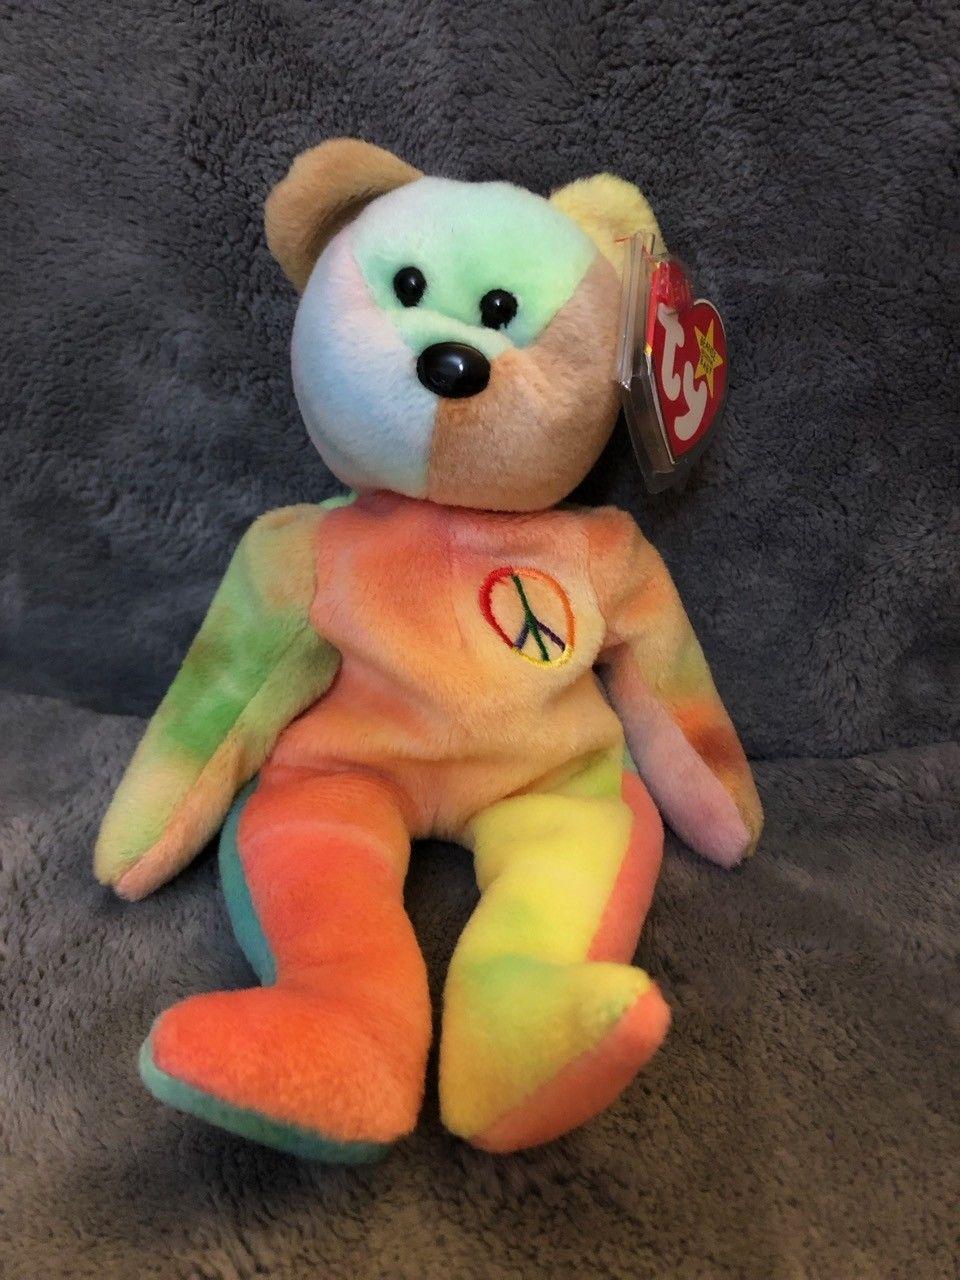 9983737dc47 Rare Retired 1996 PEACE BEAR Ty Beanie Baby and 14 similar items. 57